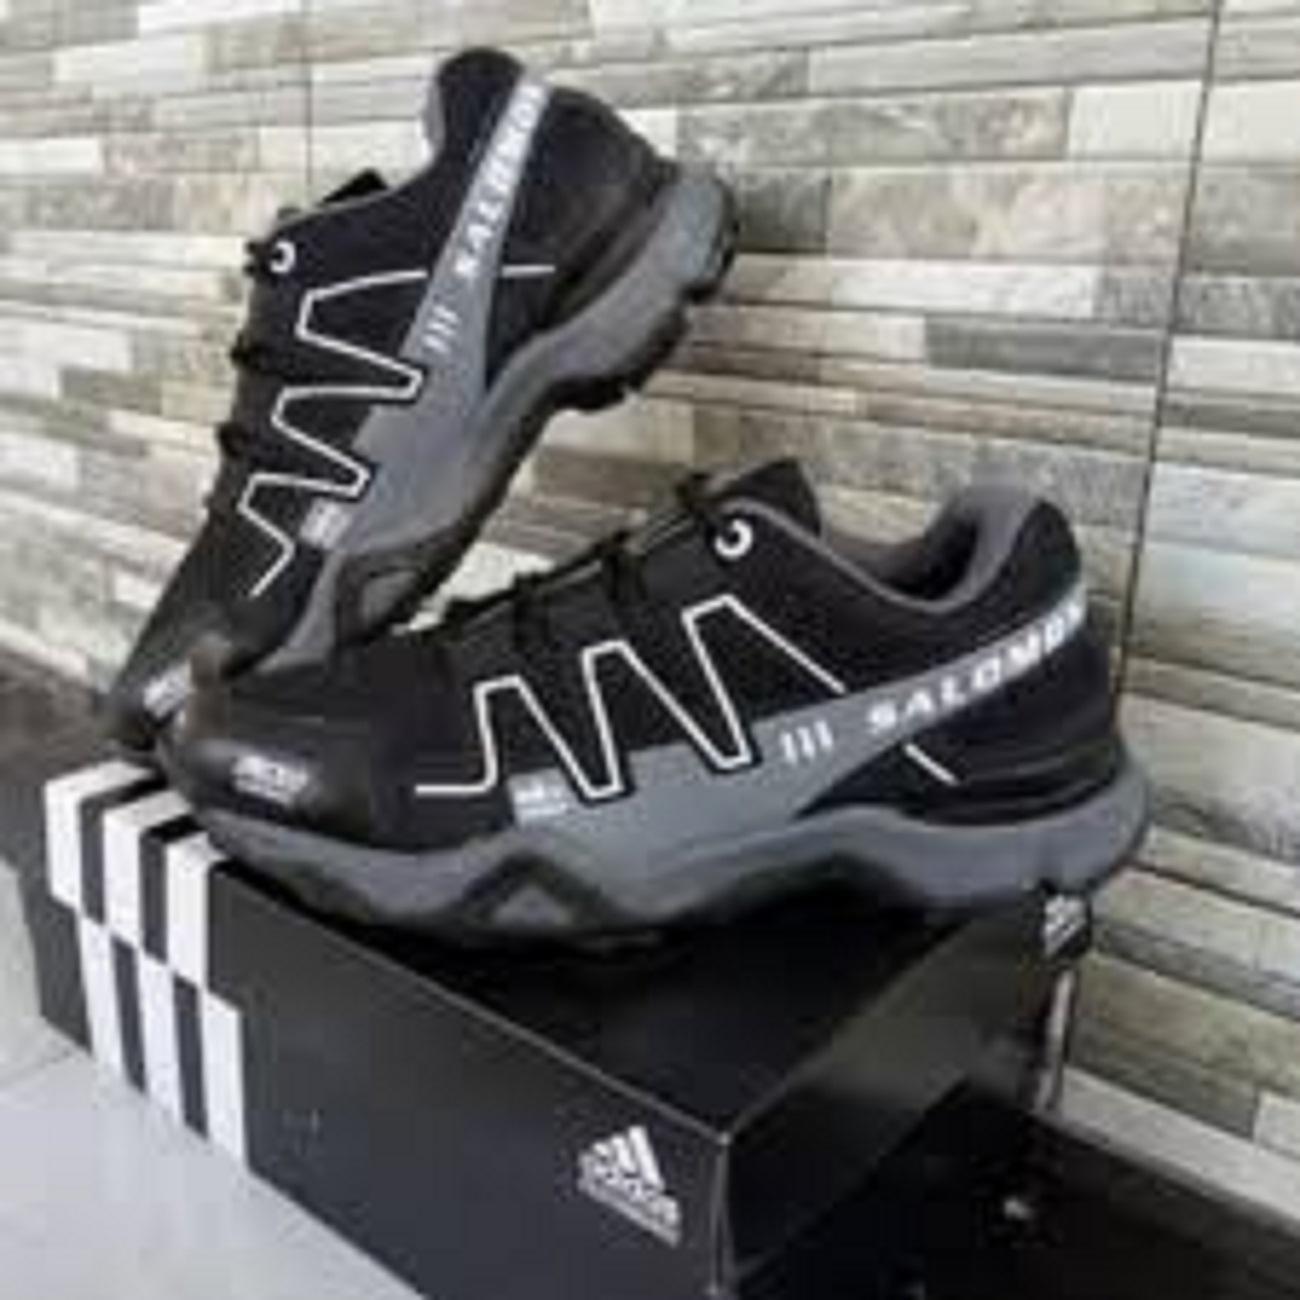 Daftar Produk Dalam Kategori Sneakers Pria Salvo Sepatu Kasual Denim Abu King Queen Shoes Slip On Srefan Jafanovski Kets Fashion Casual Olah Raga Wanita